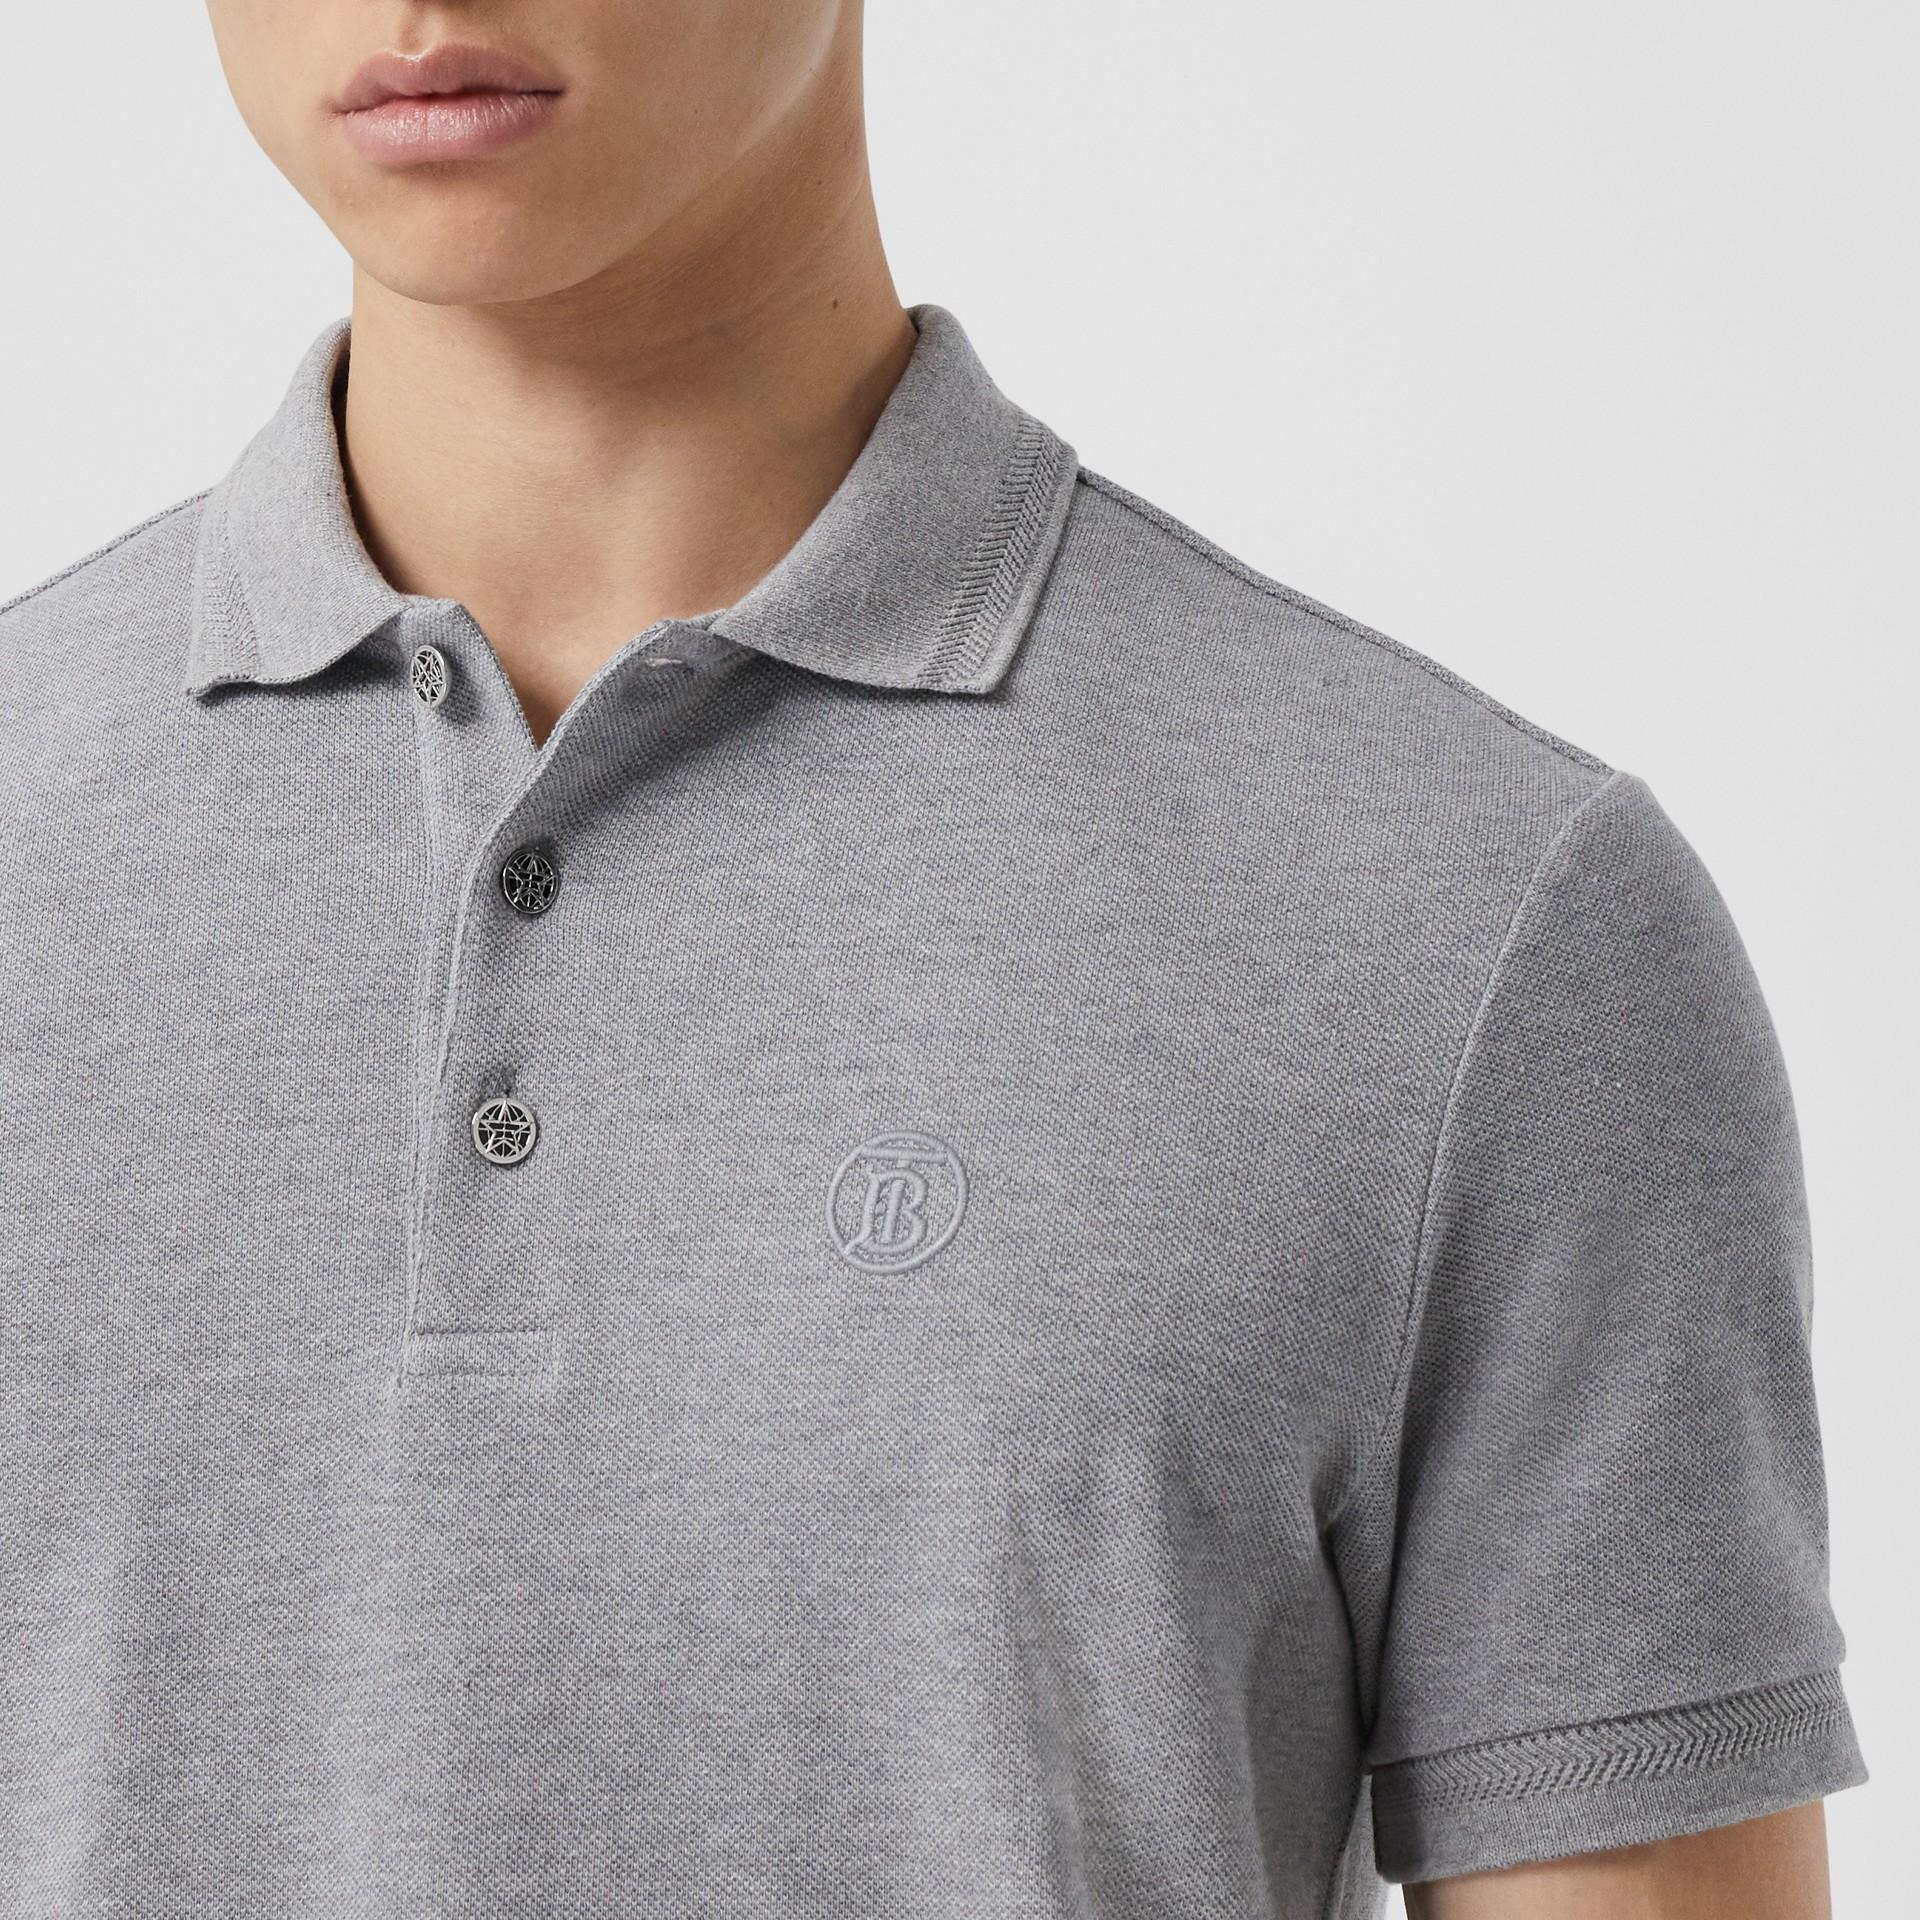 Button Detail Cotton Piqué Polo Shirt in Pale Grey Melange - Men | Burberry - gallery image 1